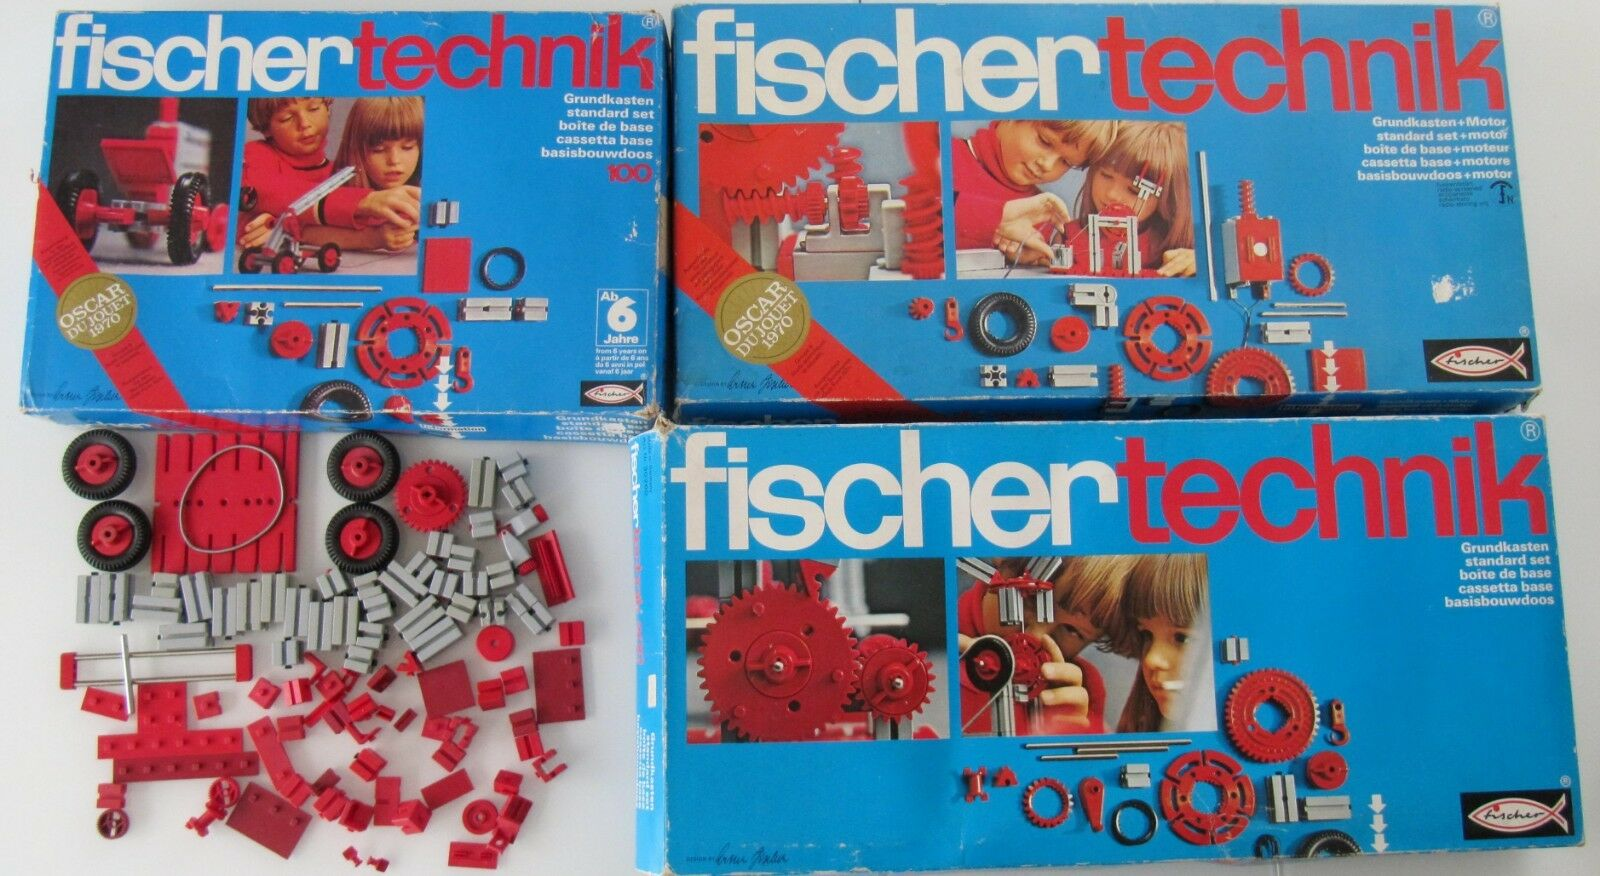 Set gigante  Fischertechnik motivo recuadro 100 + 200 + 300 con motor + herramientas